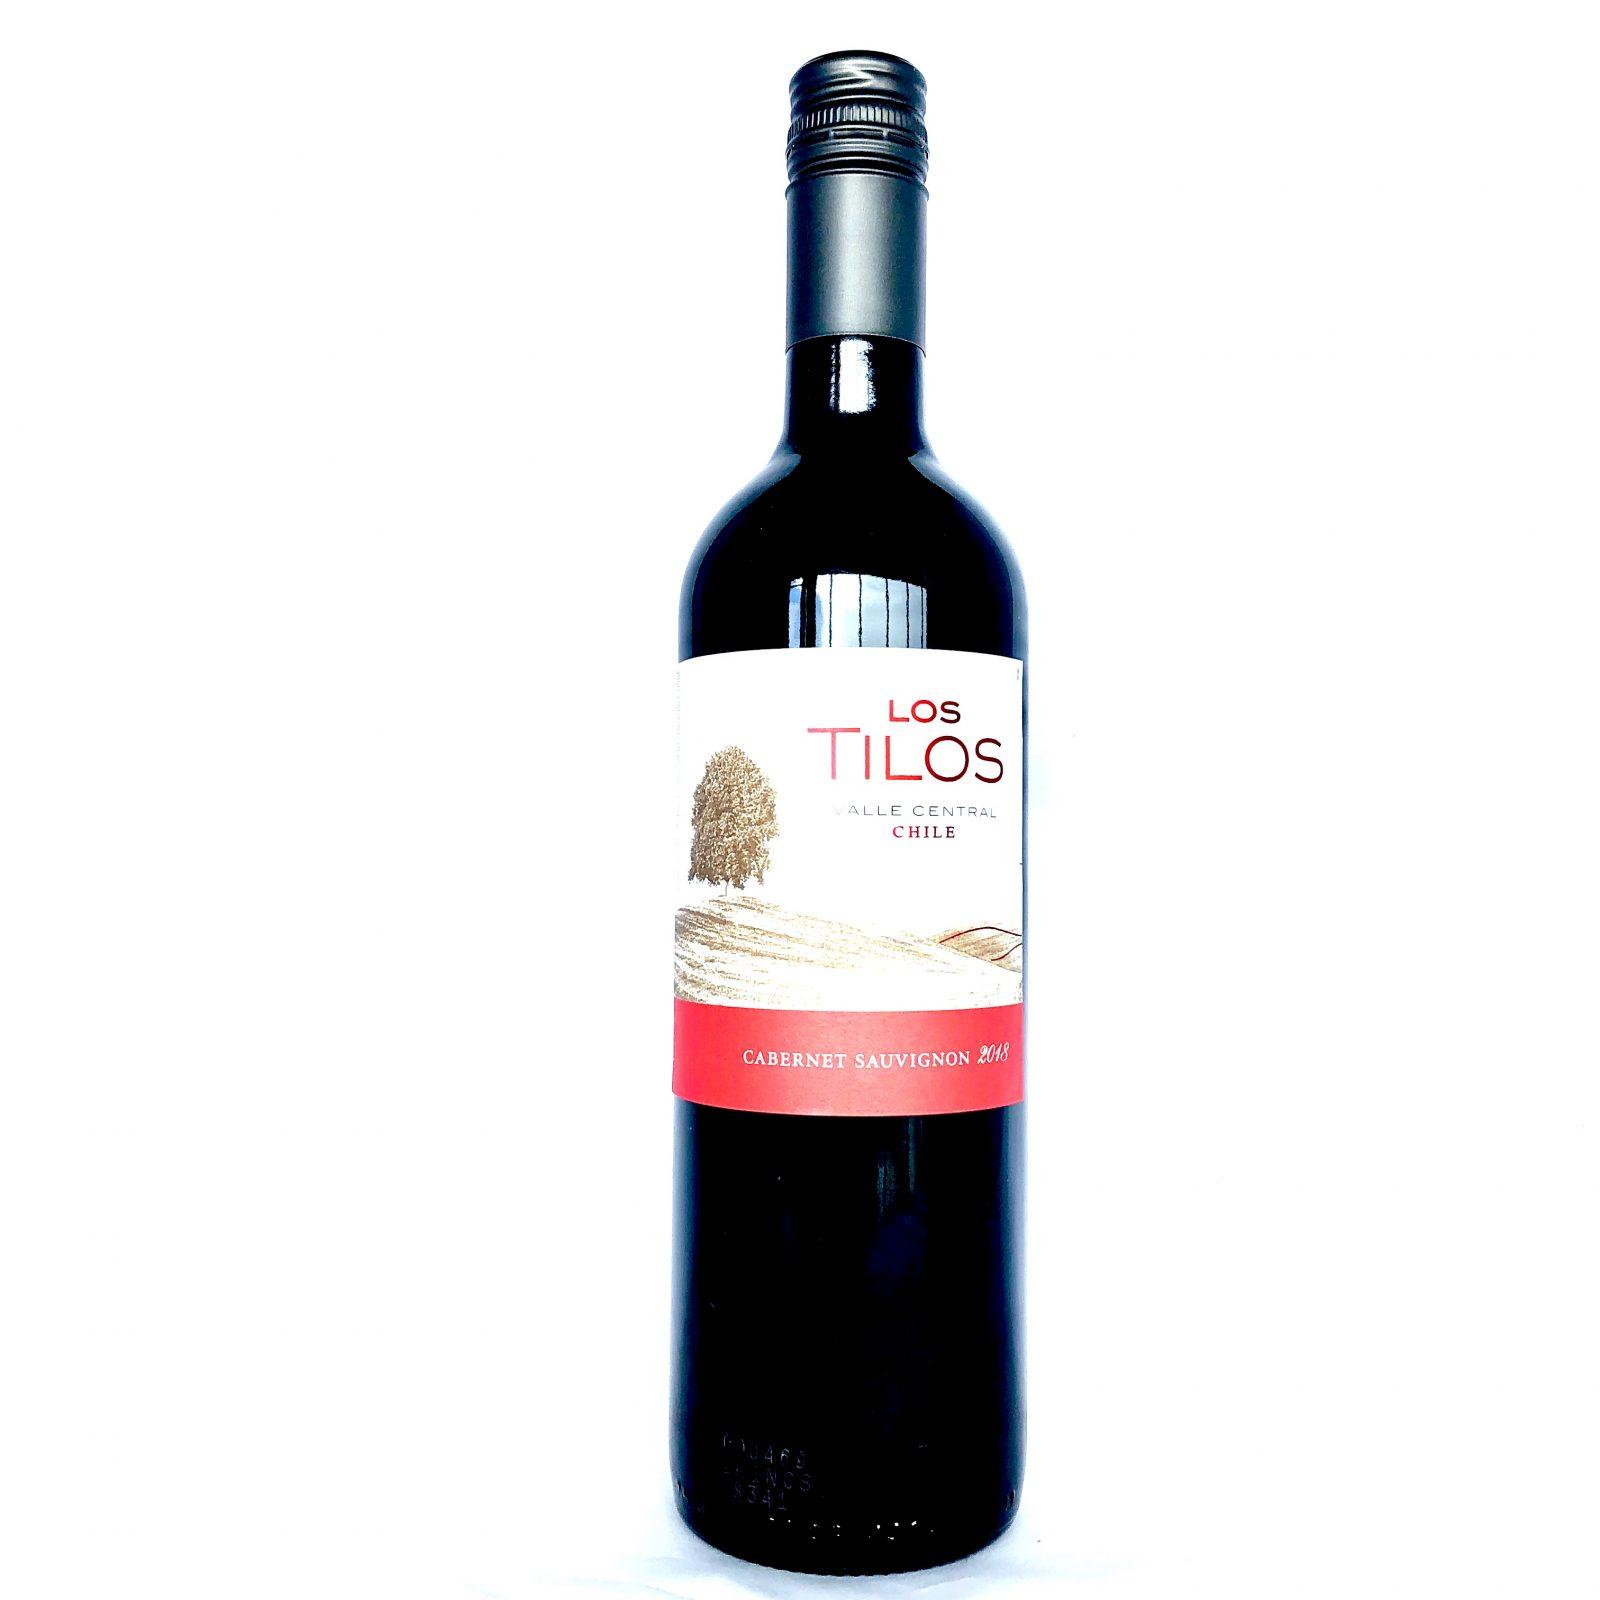 Los-Tilos-Cabernet-Sauvignon-Wijn-van-ons